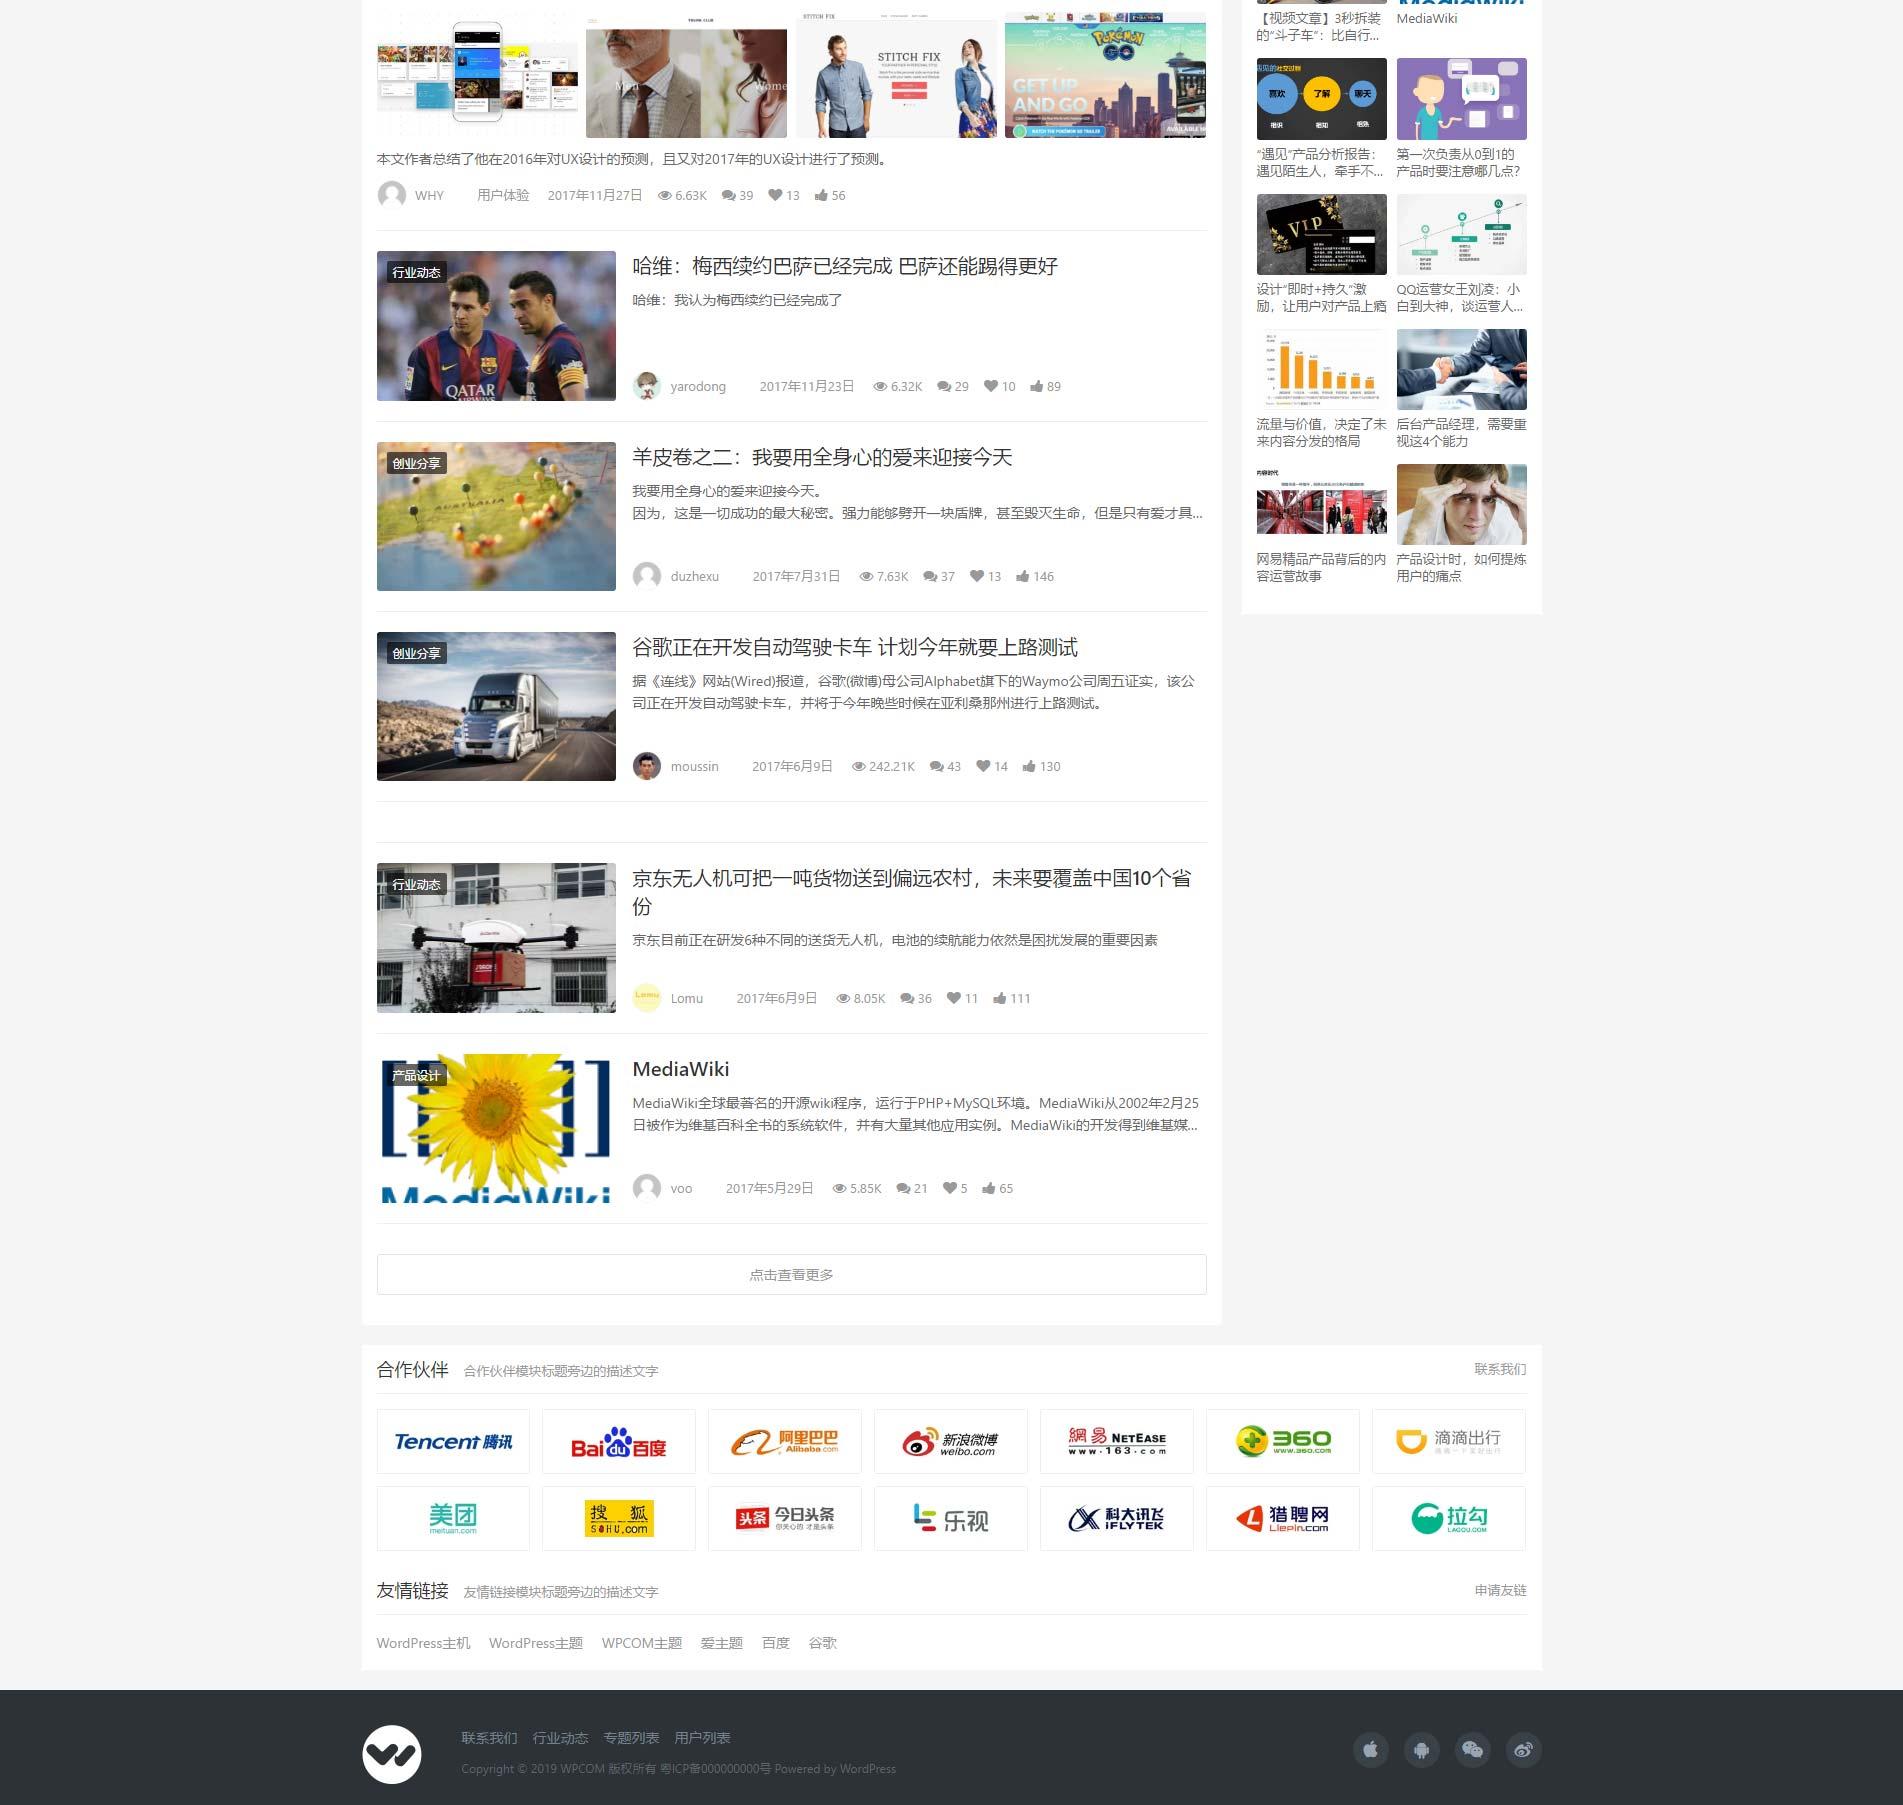 WordPress主题 JustNews v4.3免授权破解版-凡酷网  (fankuw.cn)  -  综合性资源分享平台网站